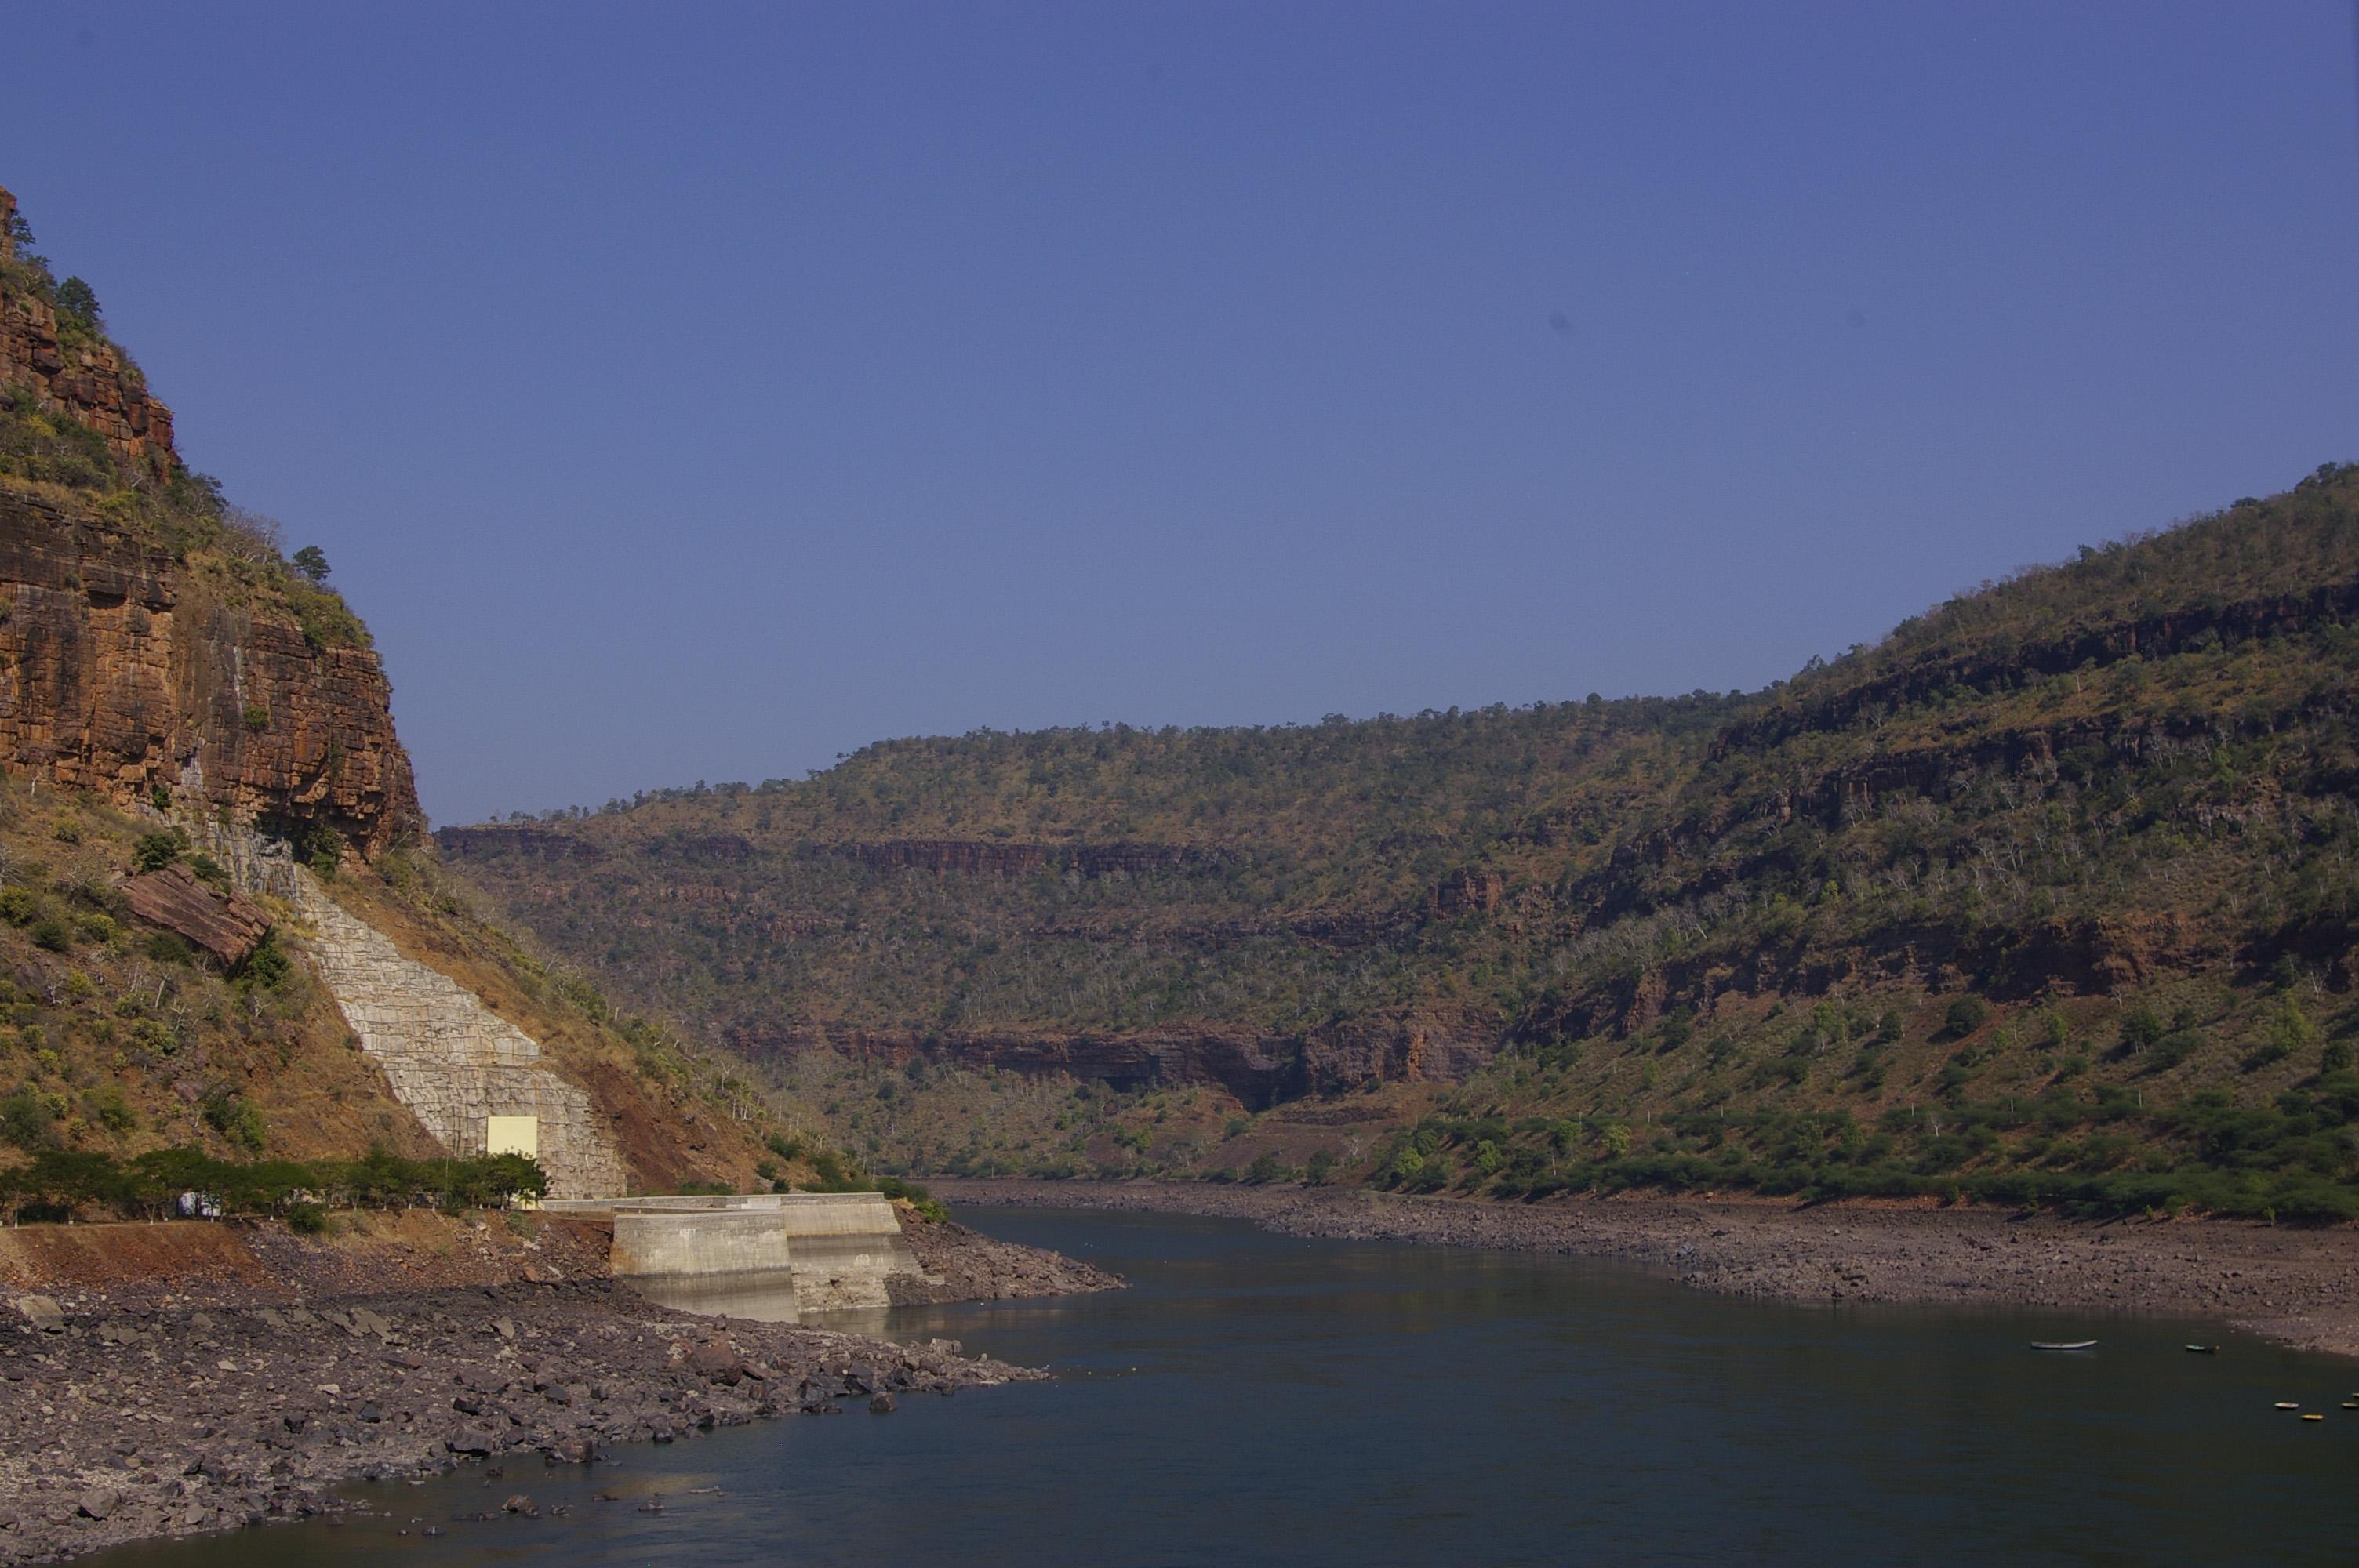 telangana rivers and projects in telugu pdf